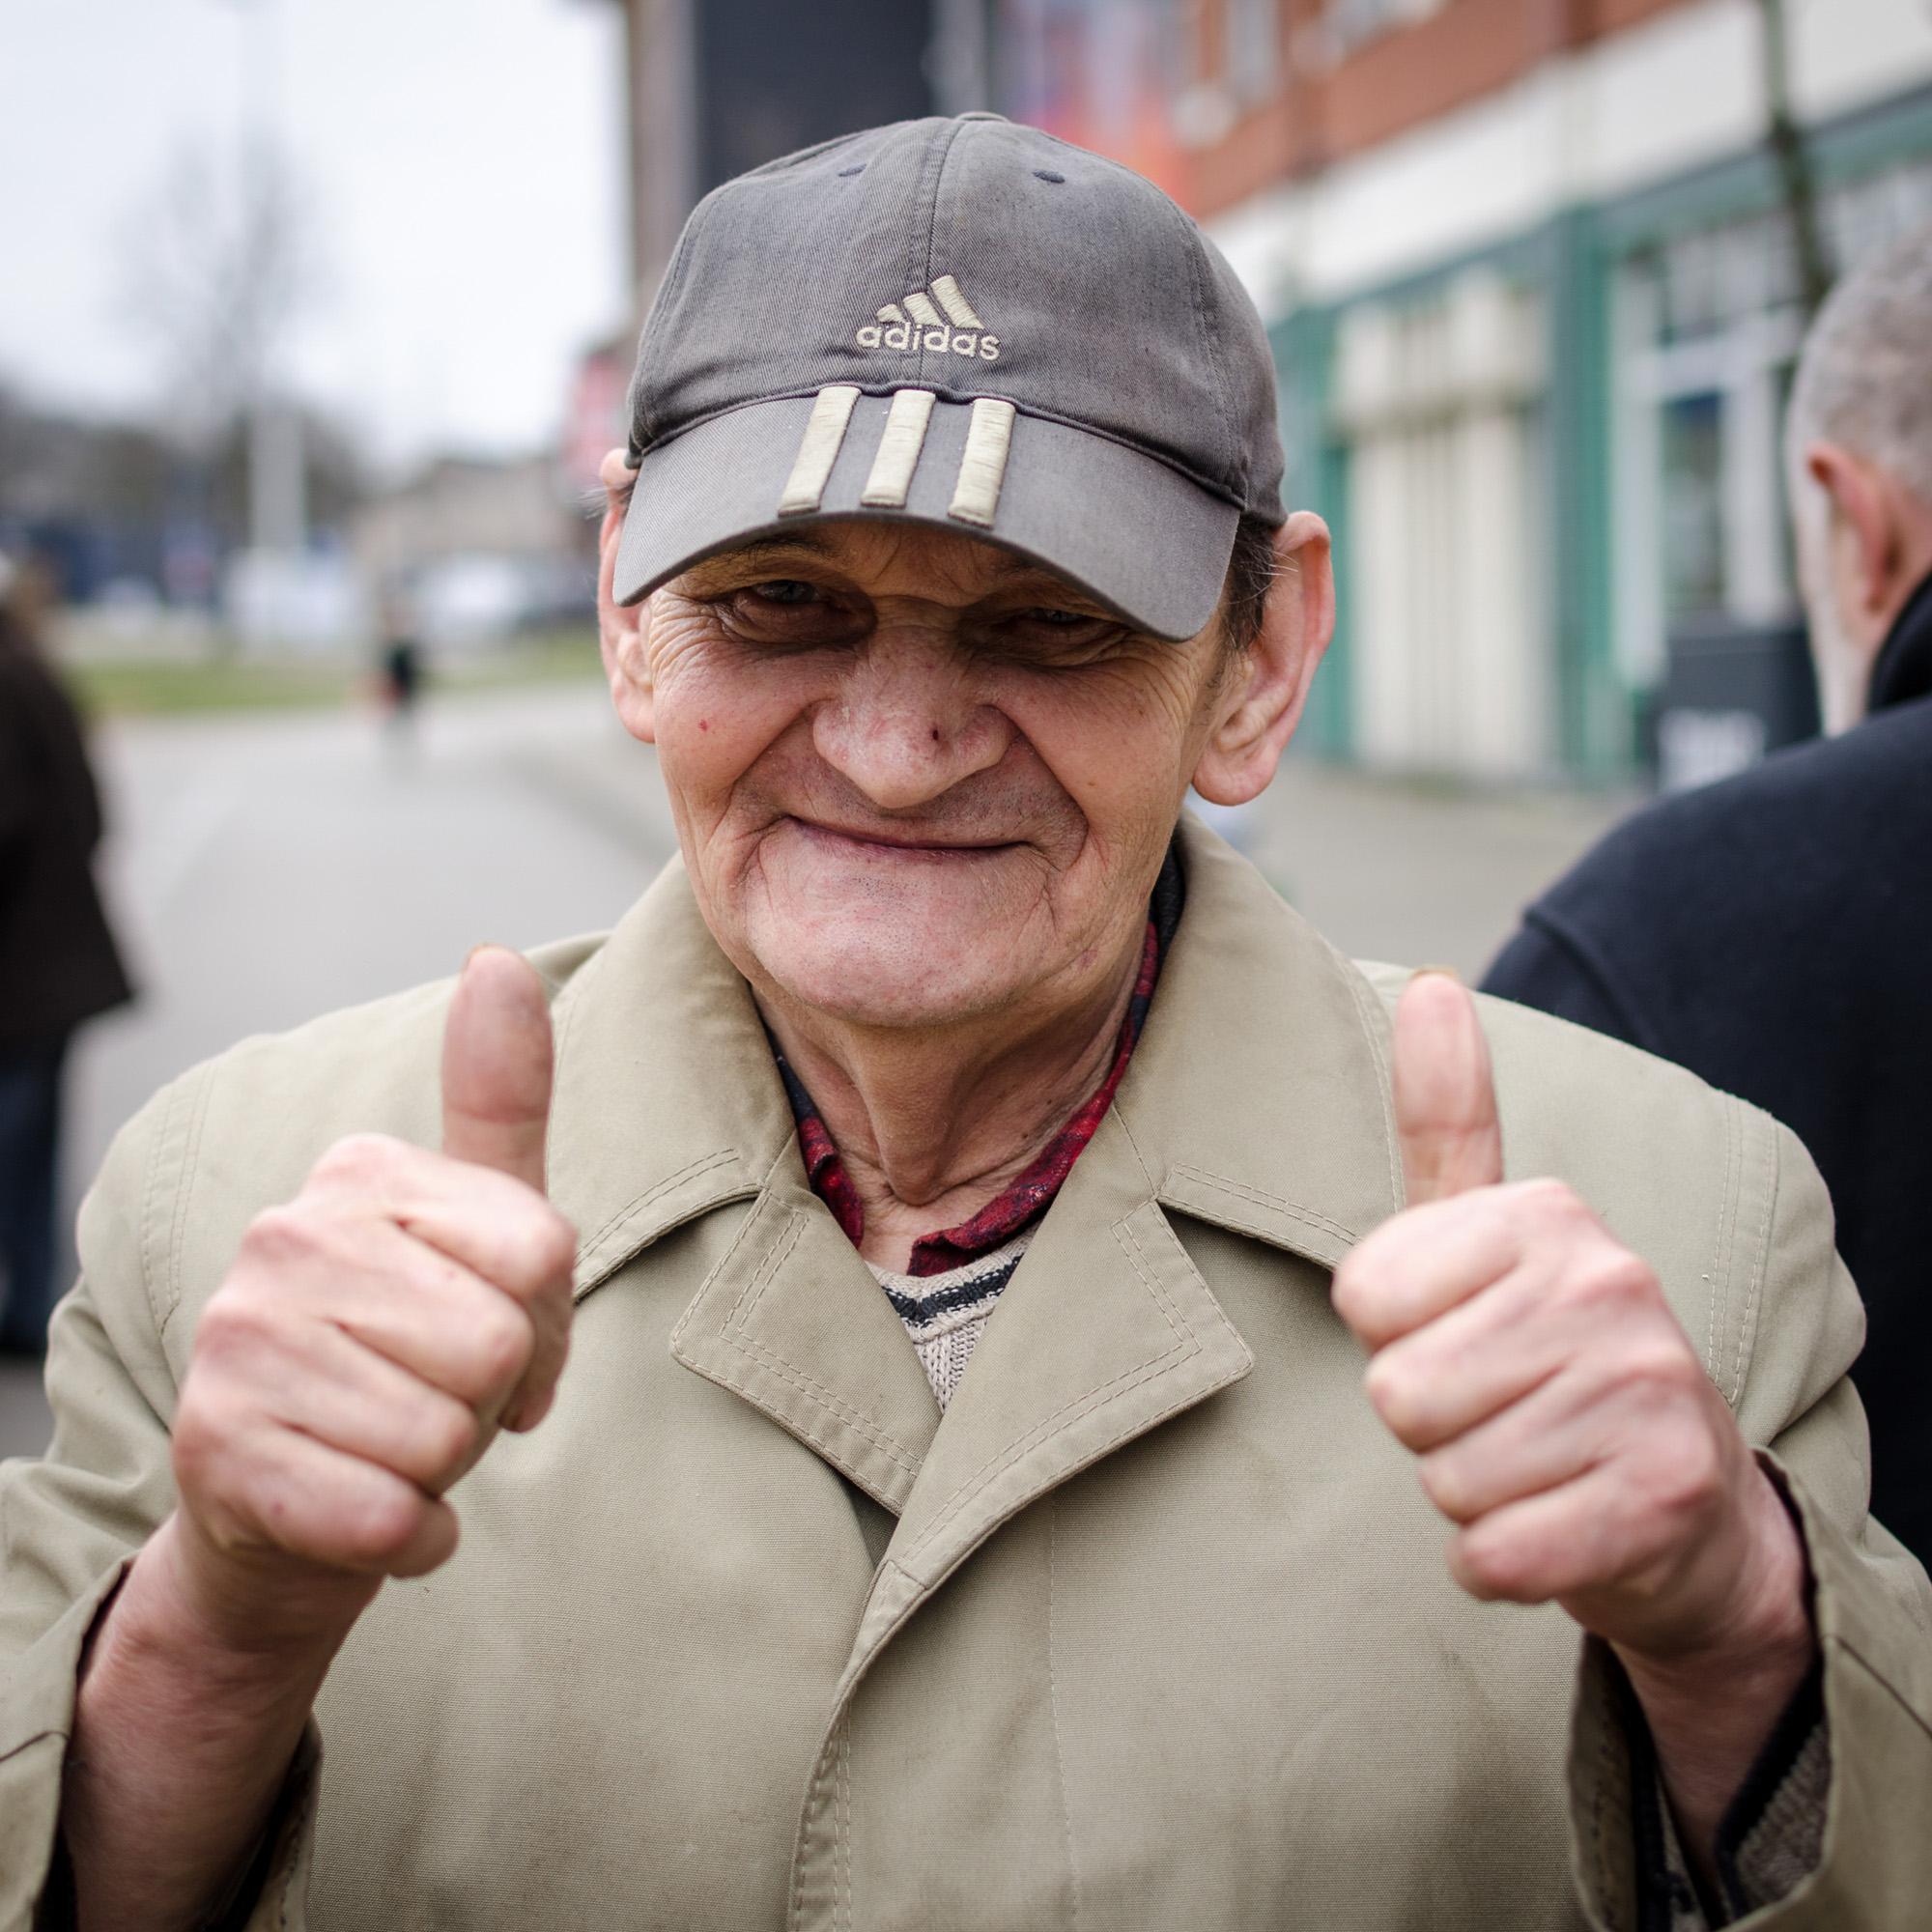 Man in stofjas 7 - straatfotografie :: foto-rv